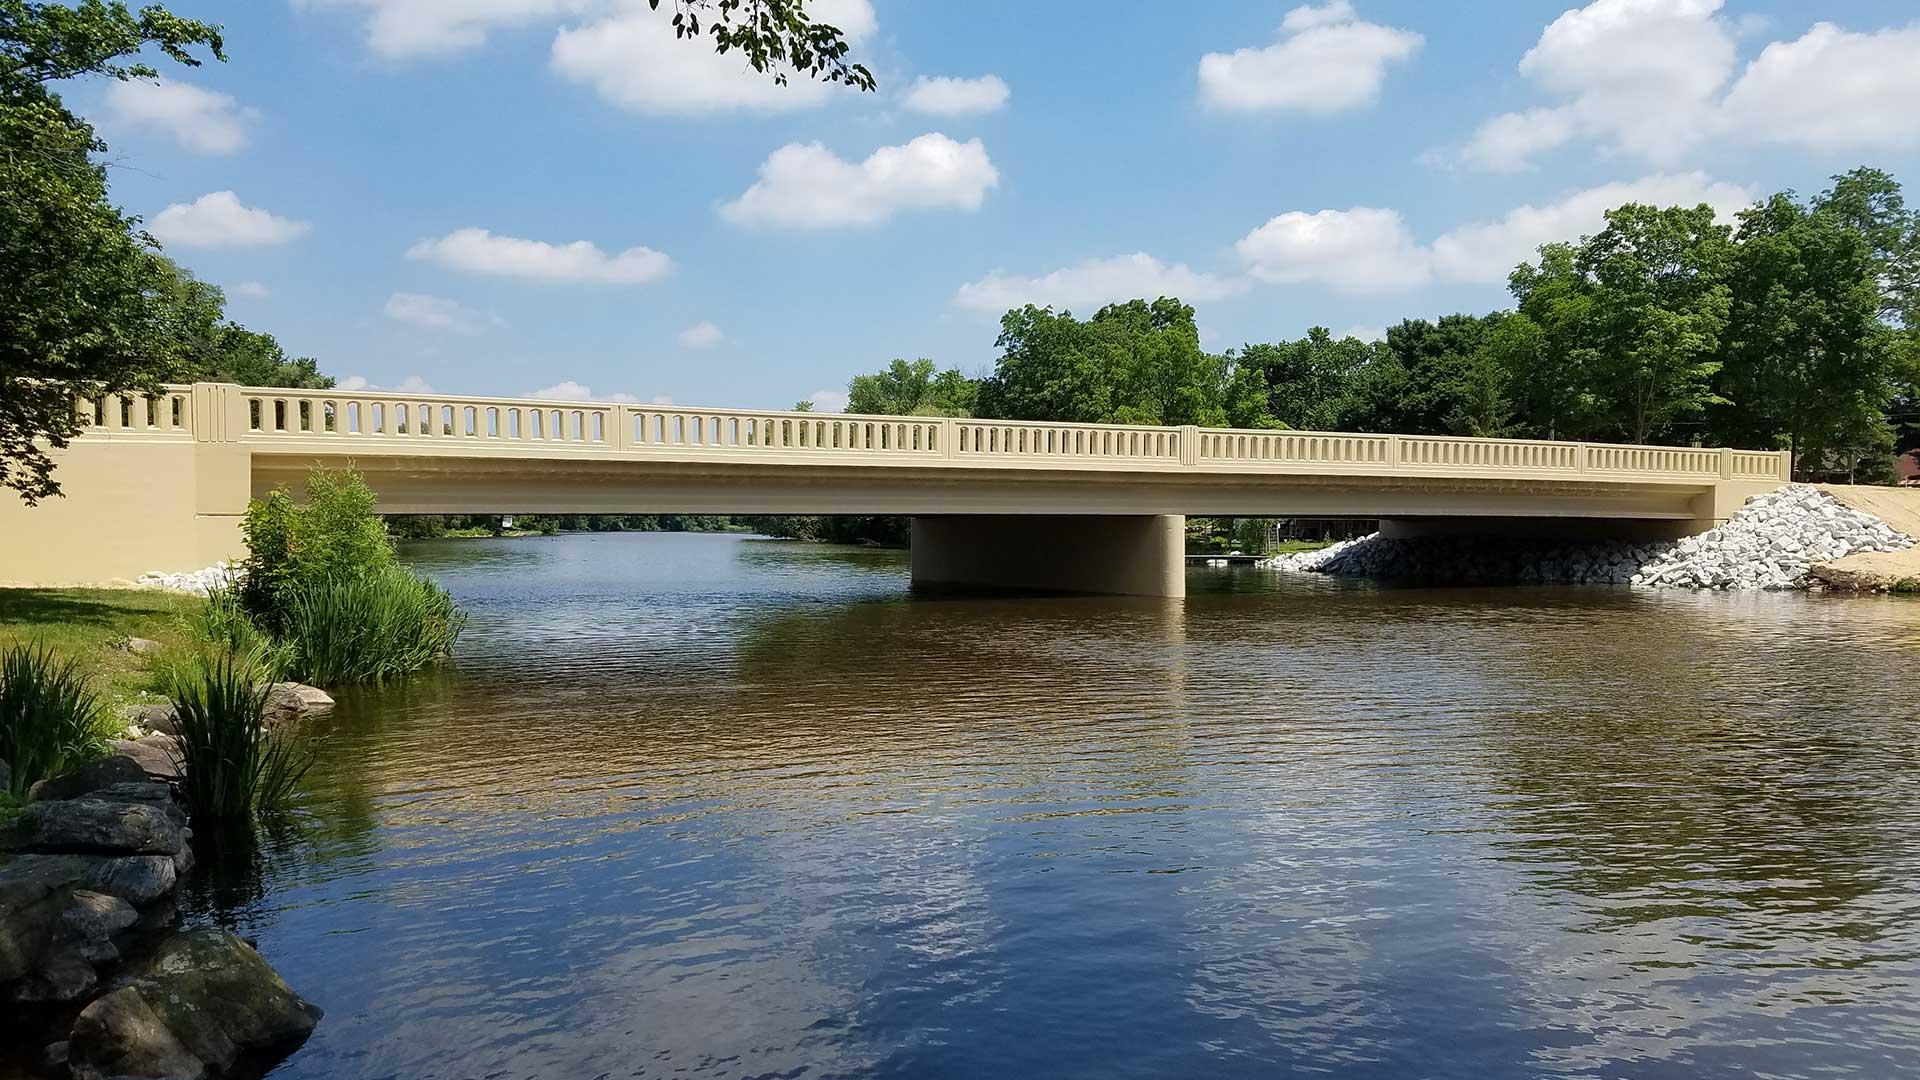 CTH D Bridge Replacement